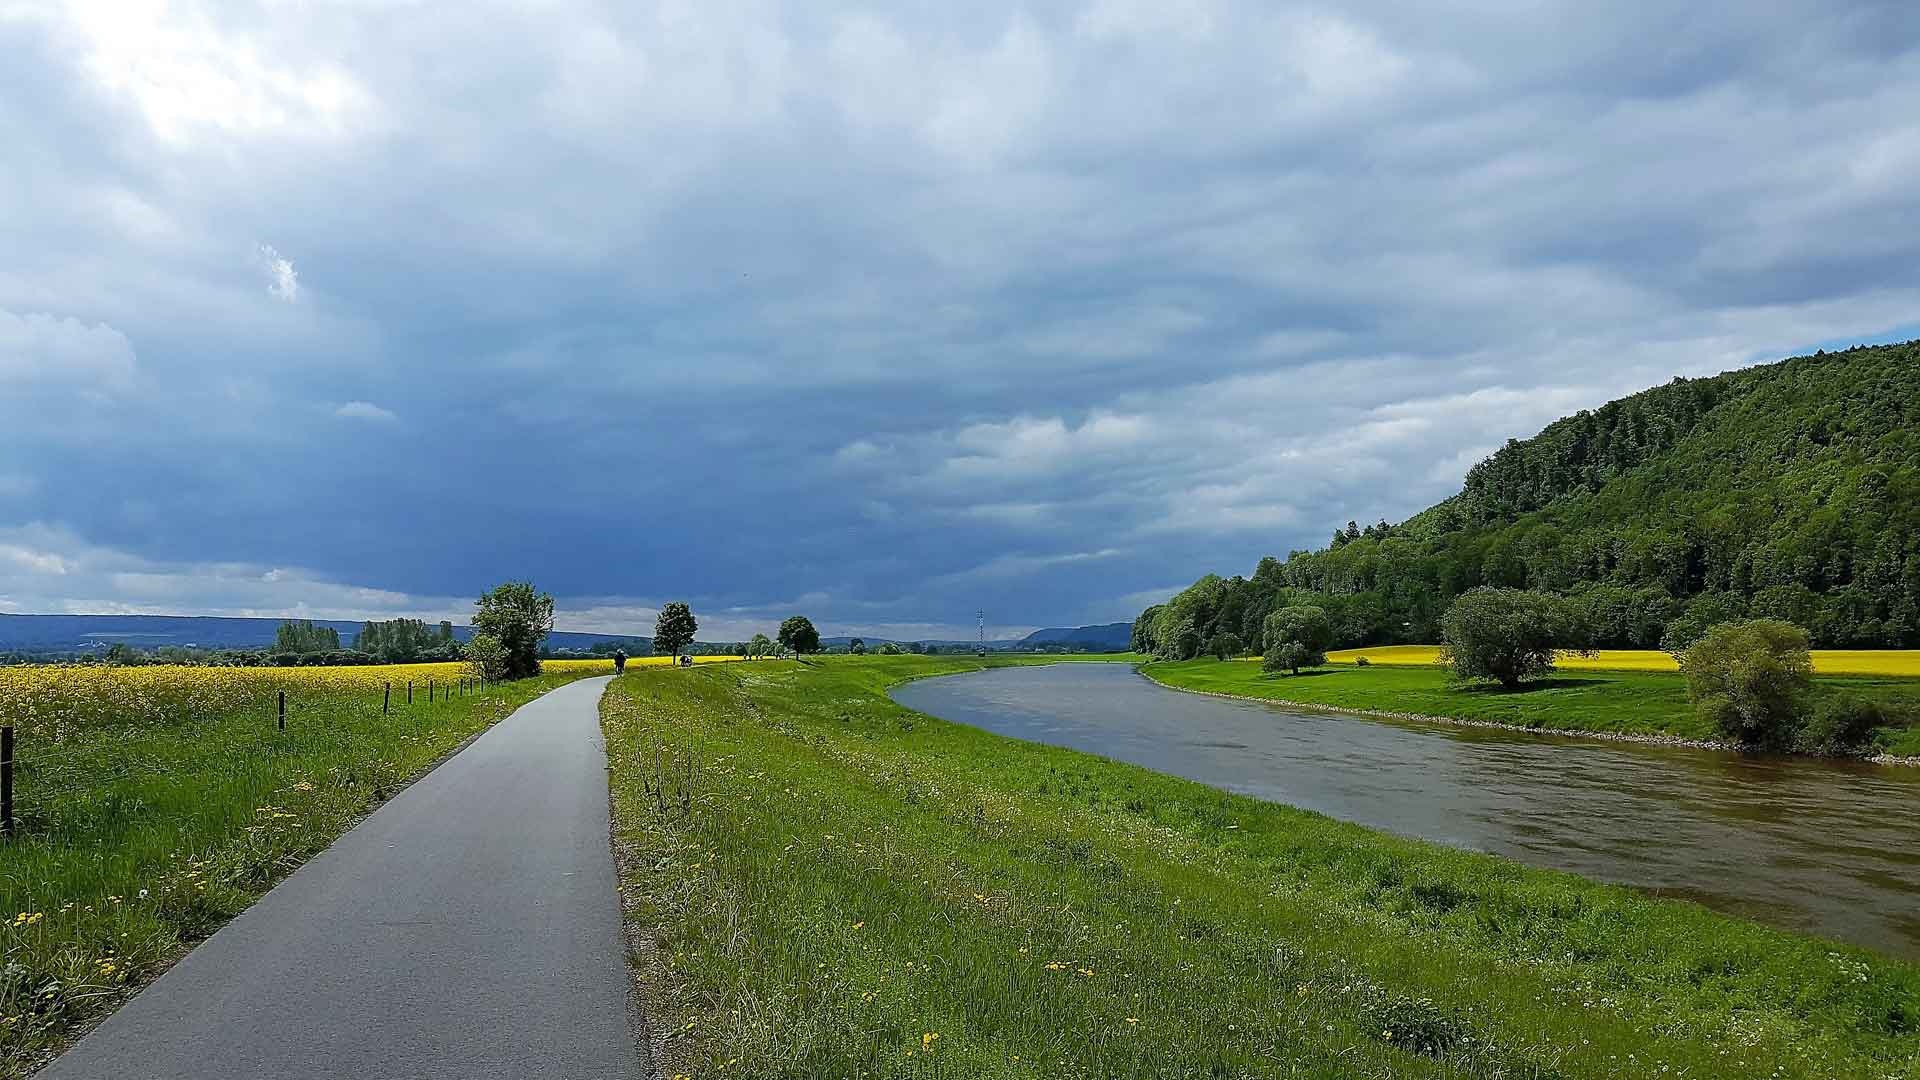 Fietsen over de Weserradweg.© fietsvakantie-duitsland.nl